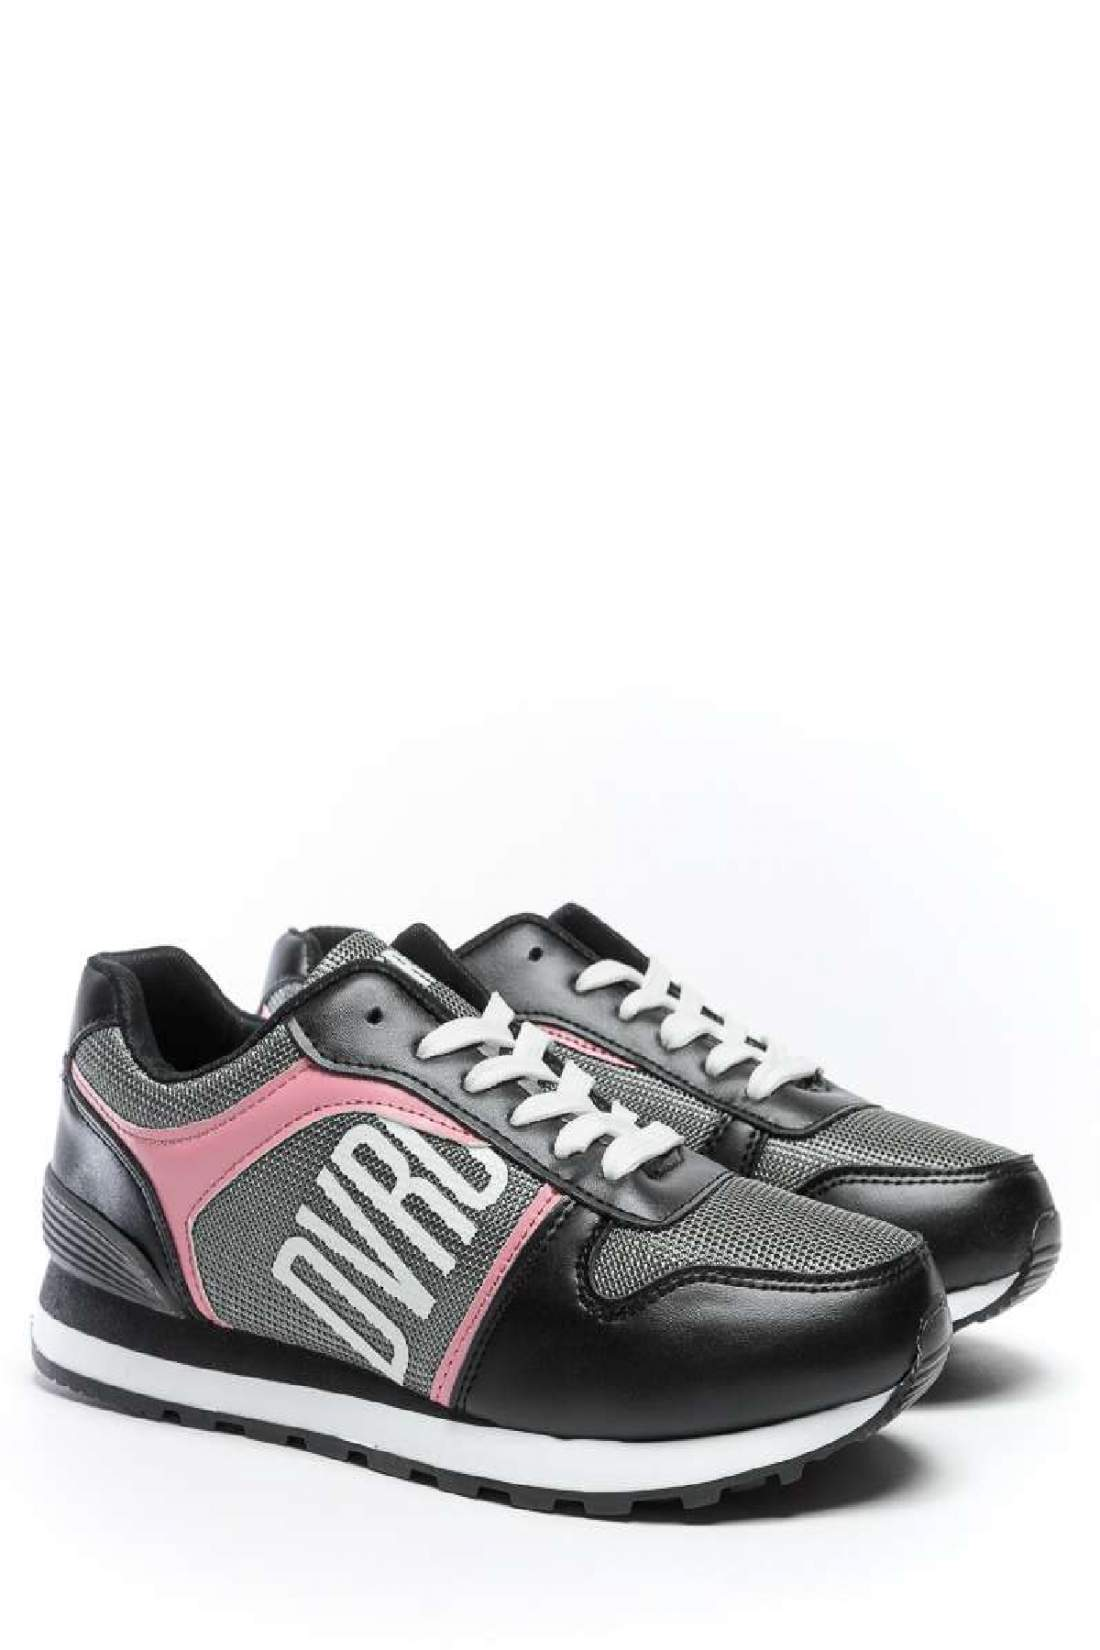 Devergo NIKA női sportcipő - Fekete-rózsa